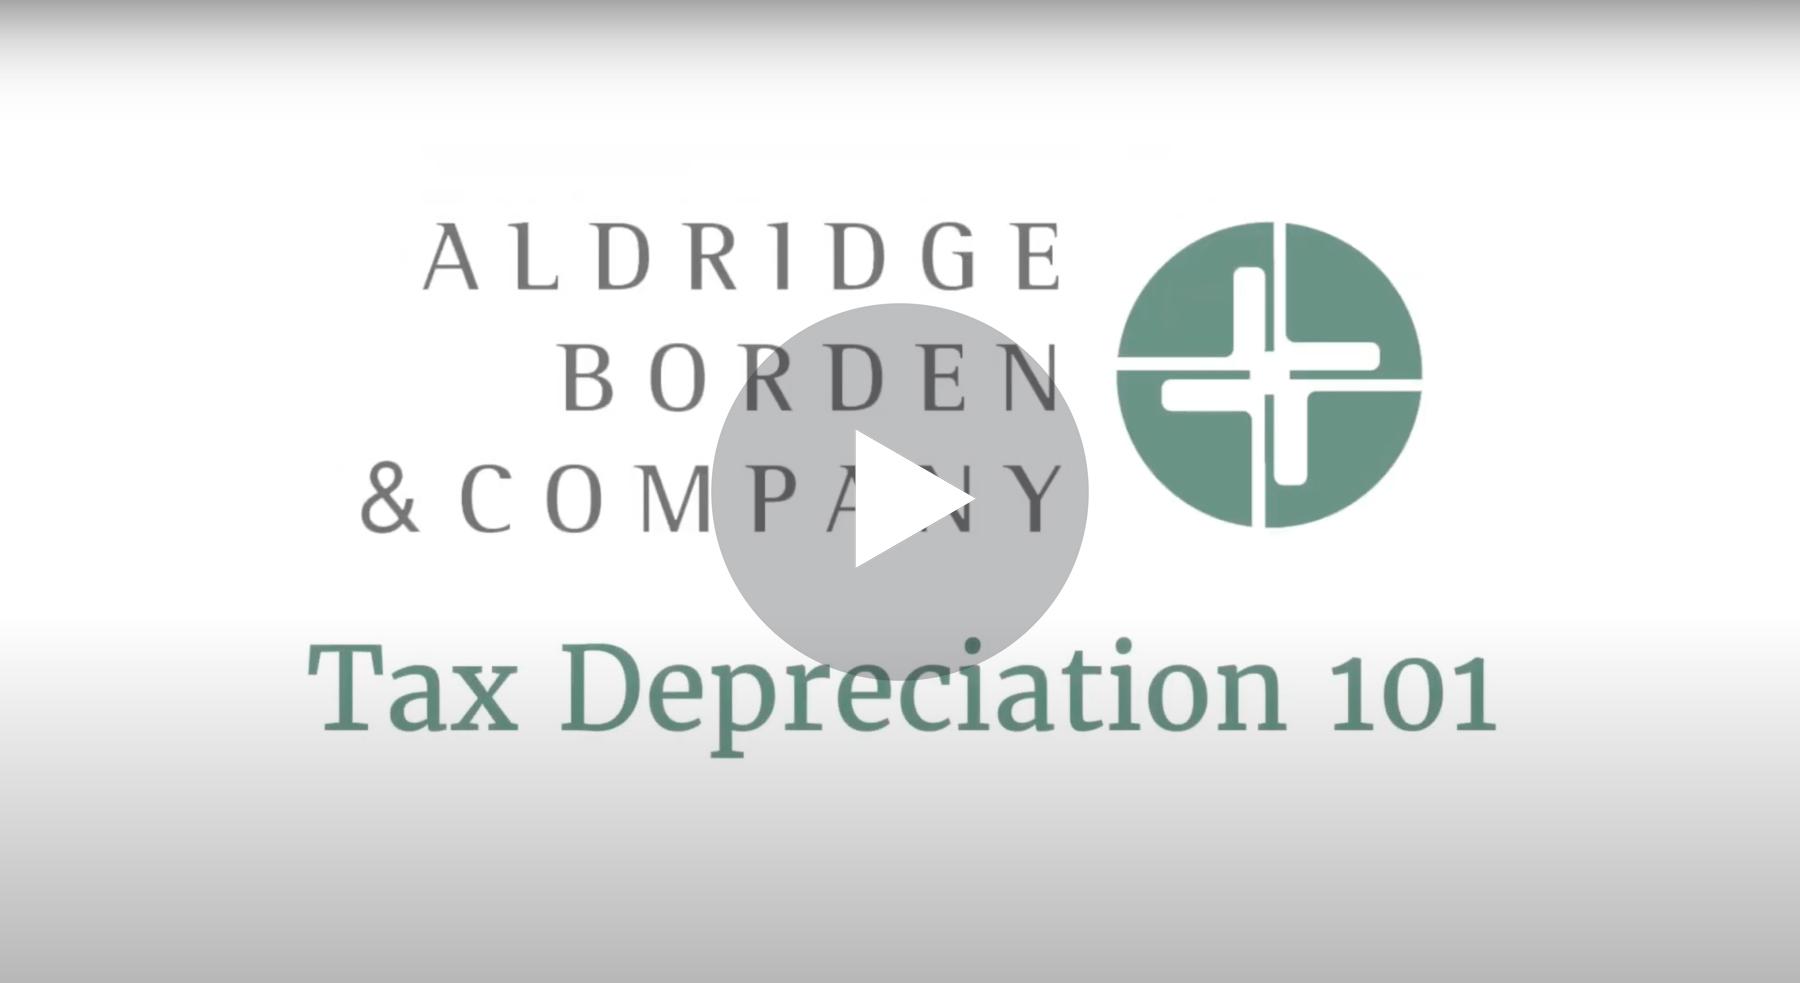 Tax Depreciation 101